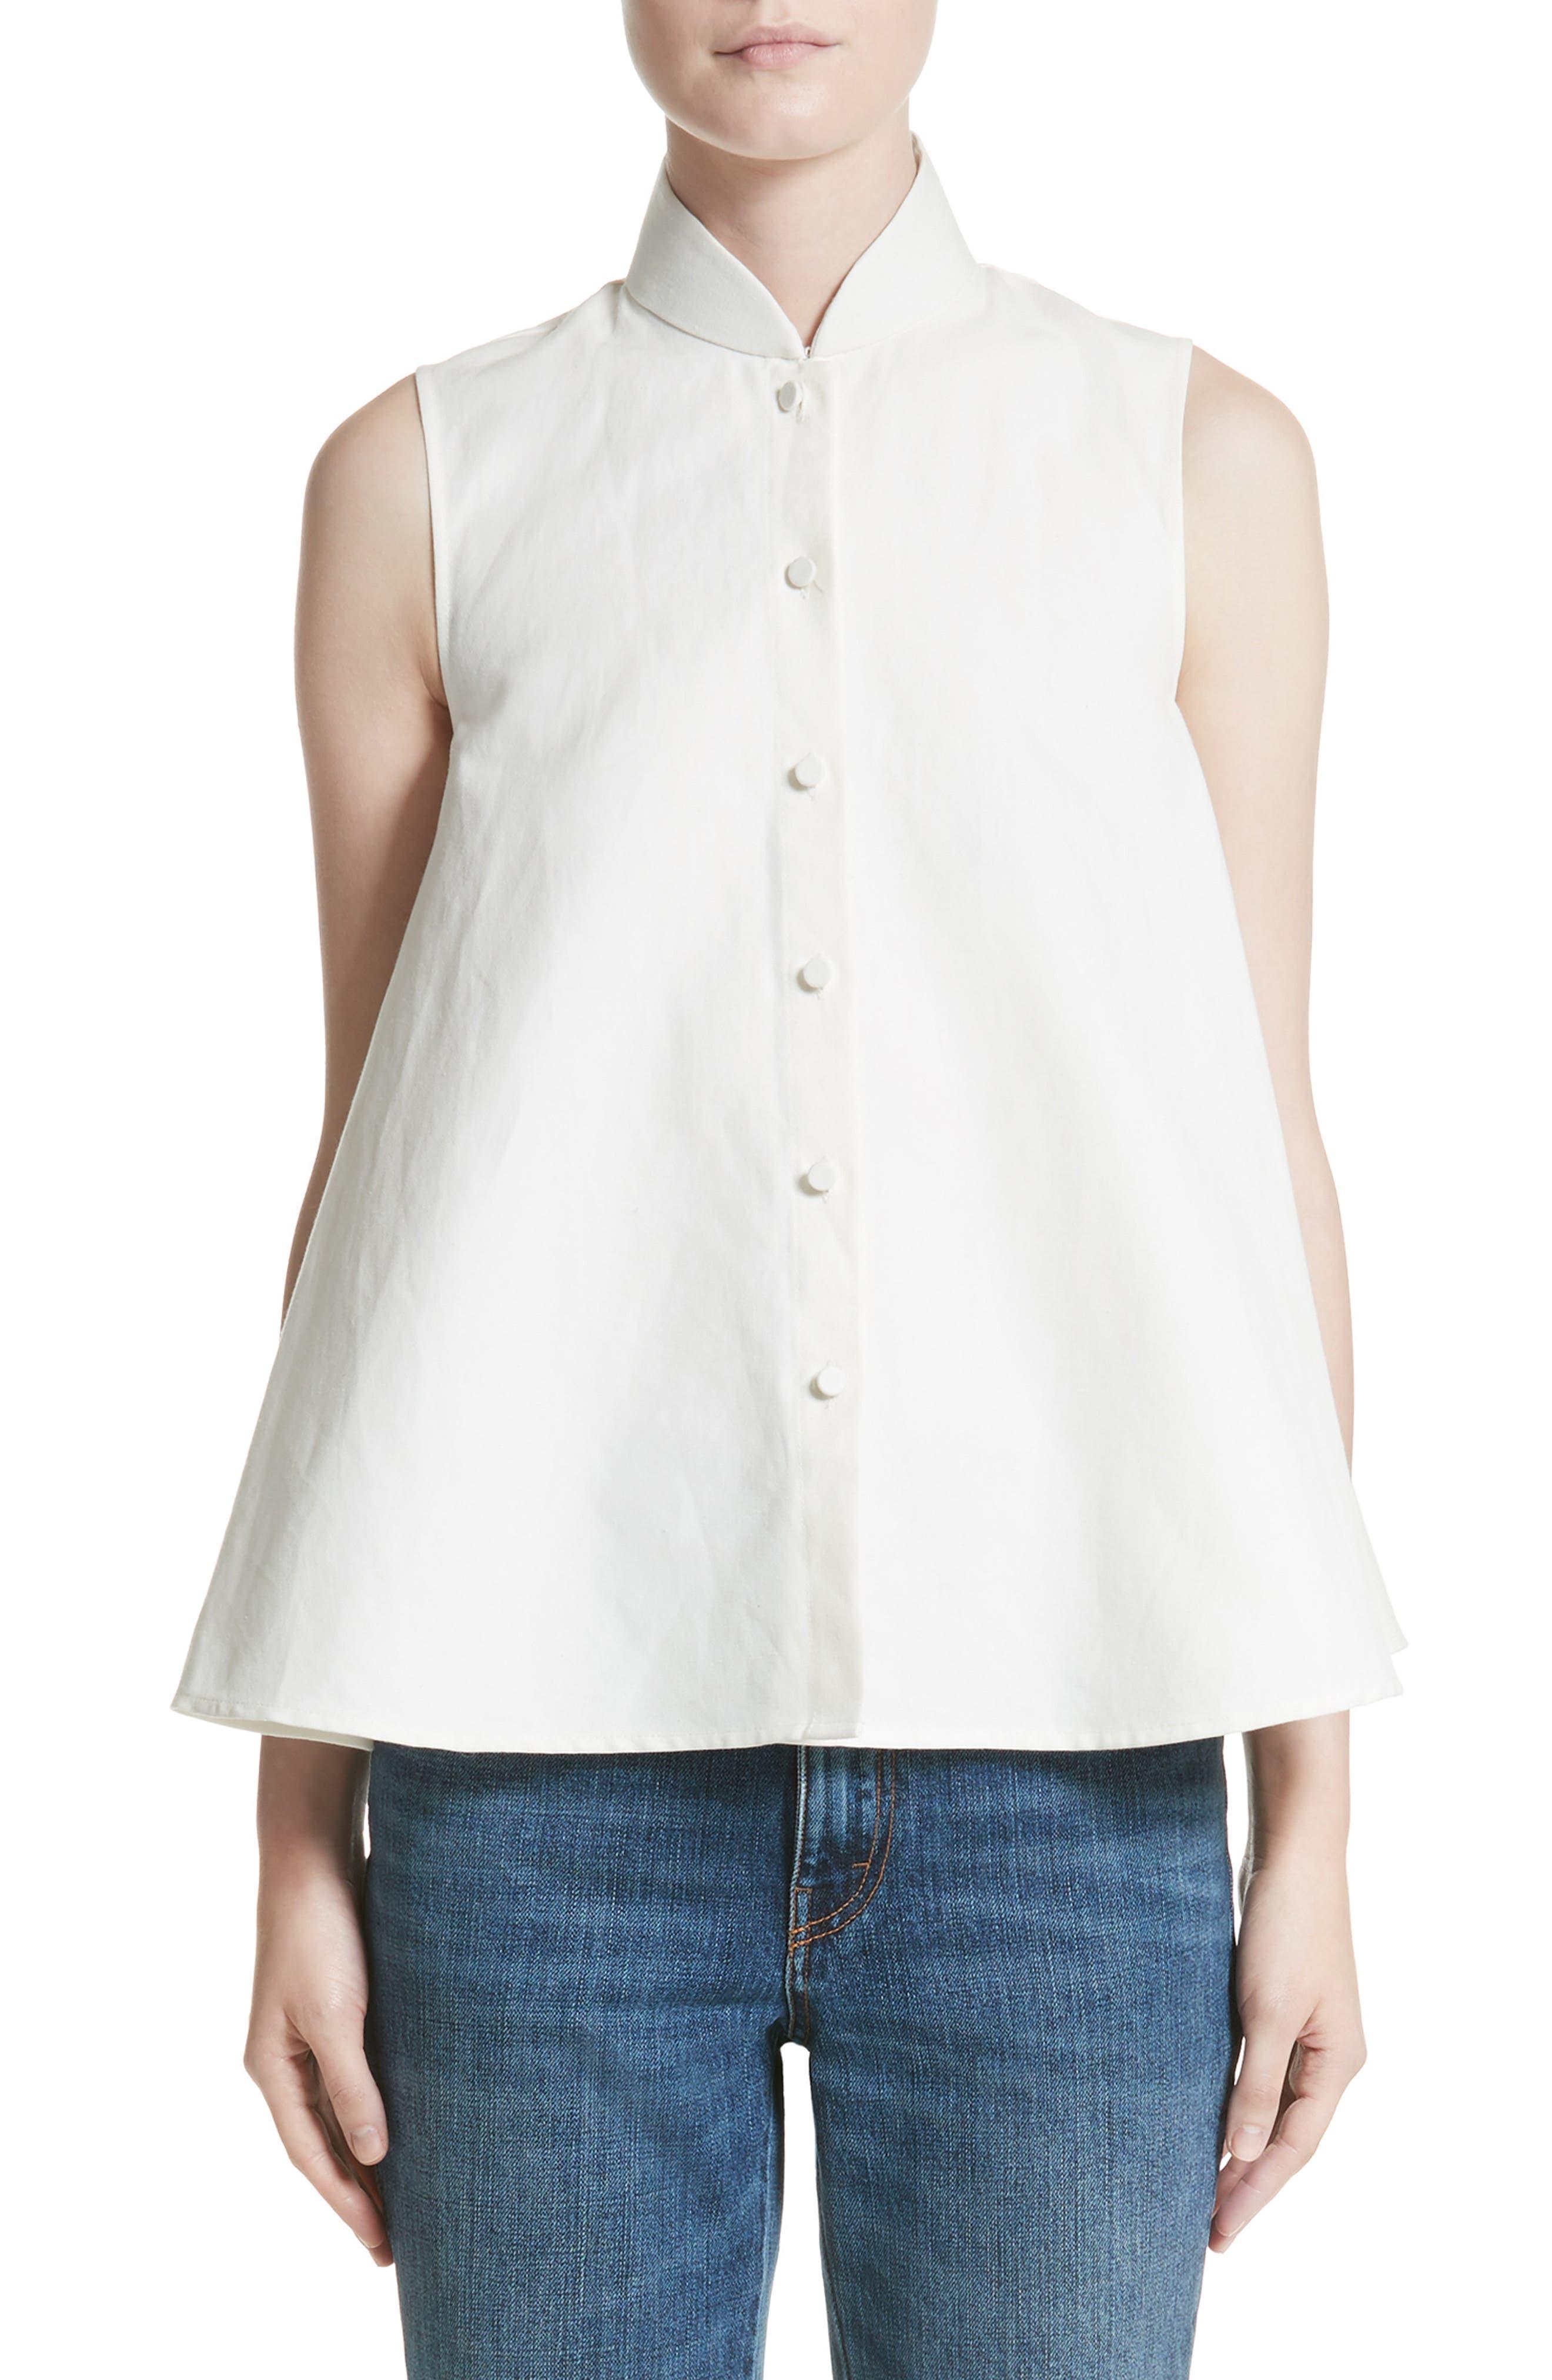 Co Linen & Cotton Swing Top